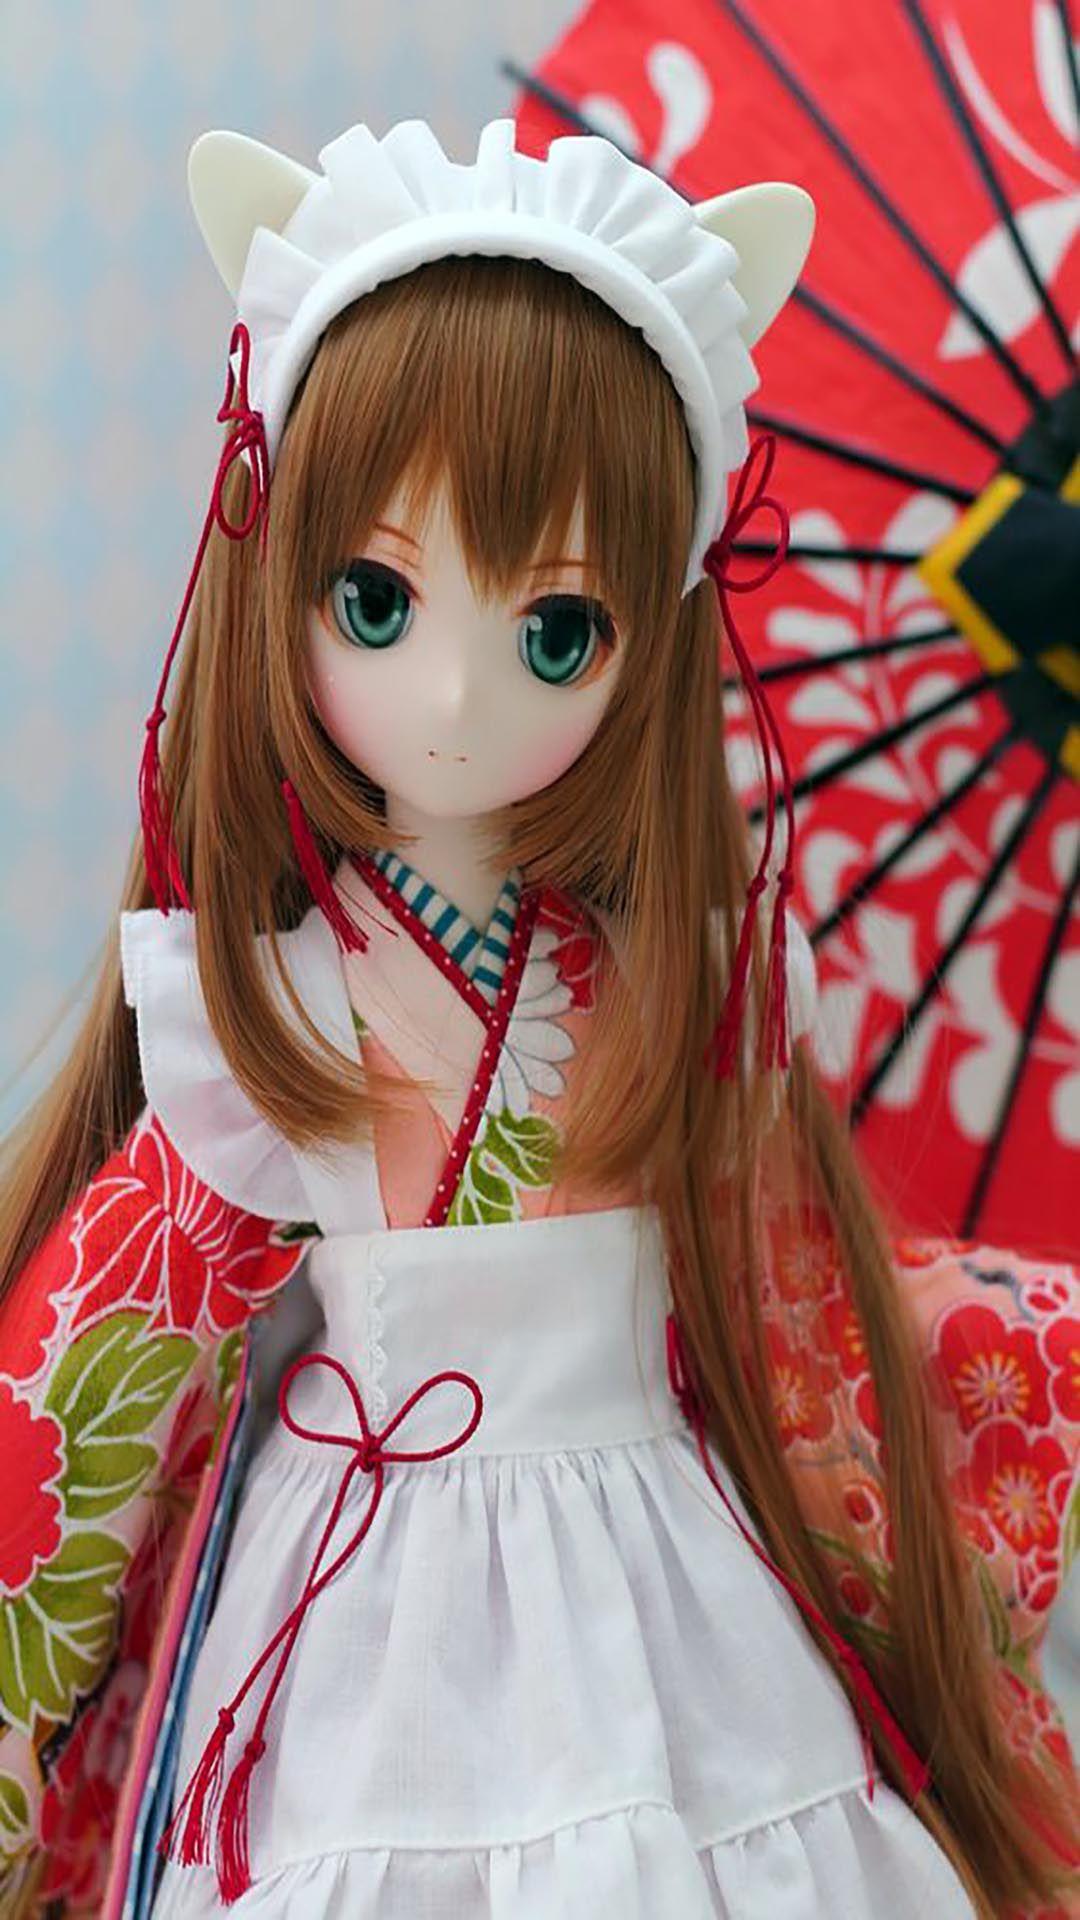 Doll 226 anime dolls beautiful dolls japanese dolls